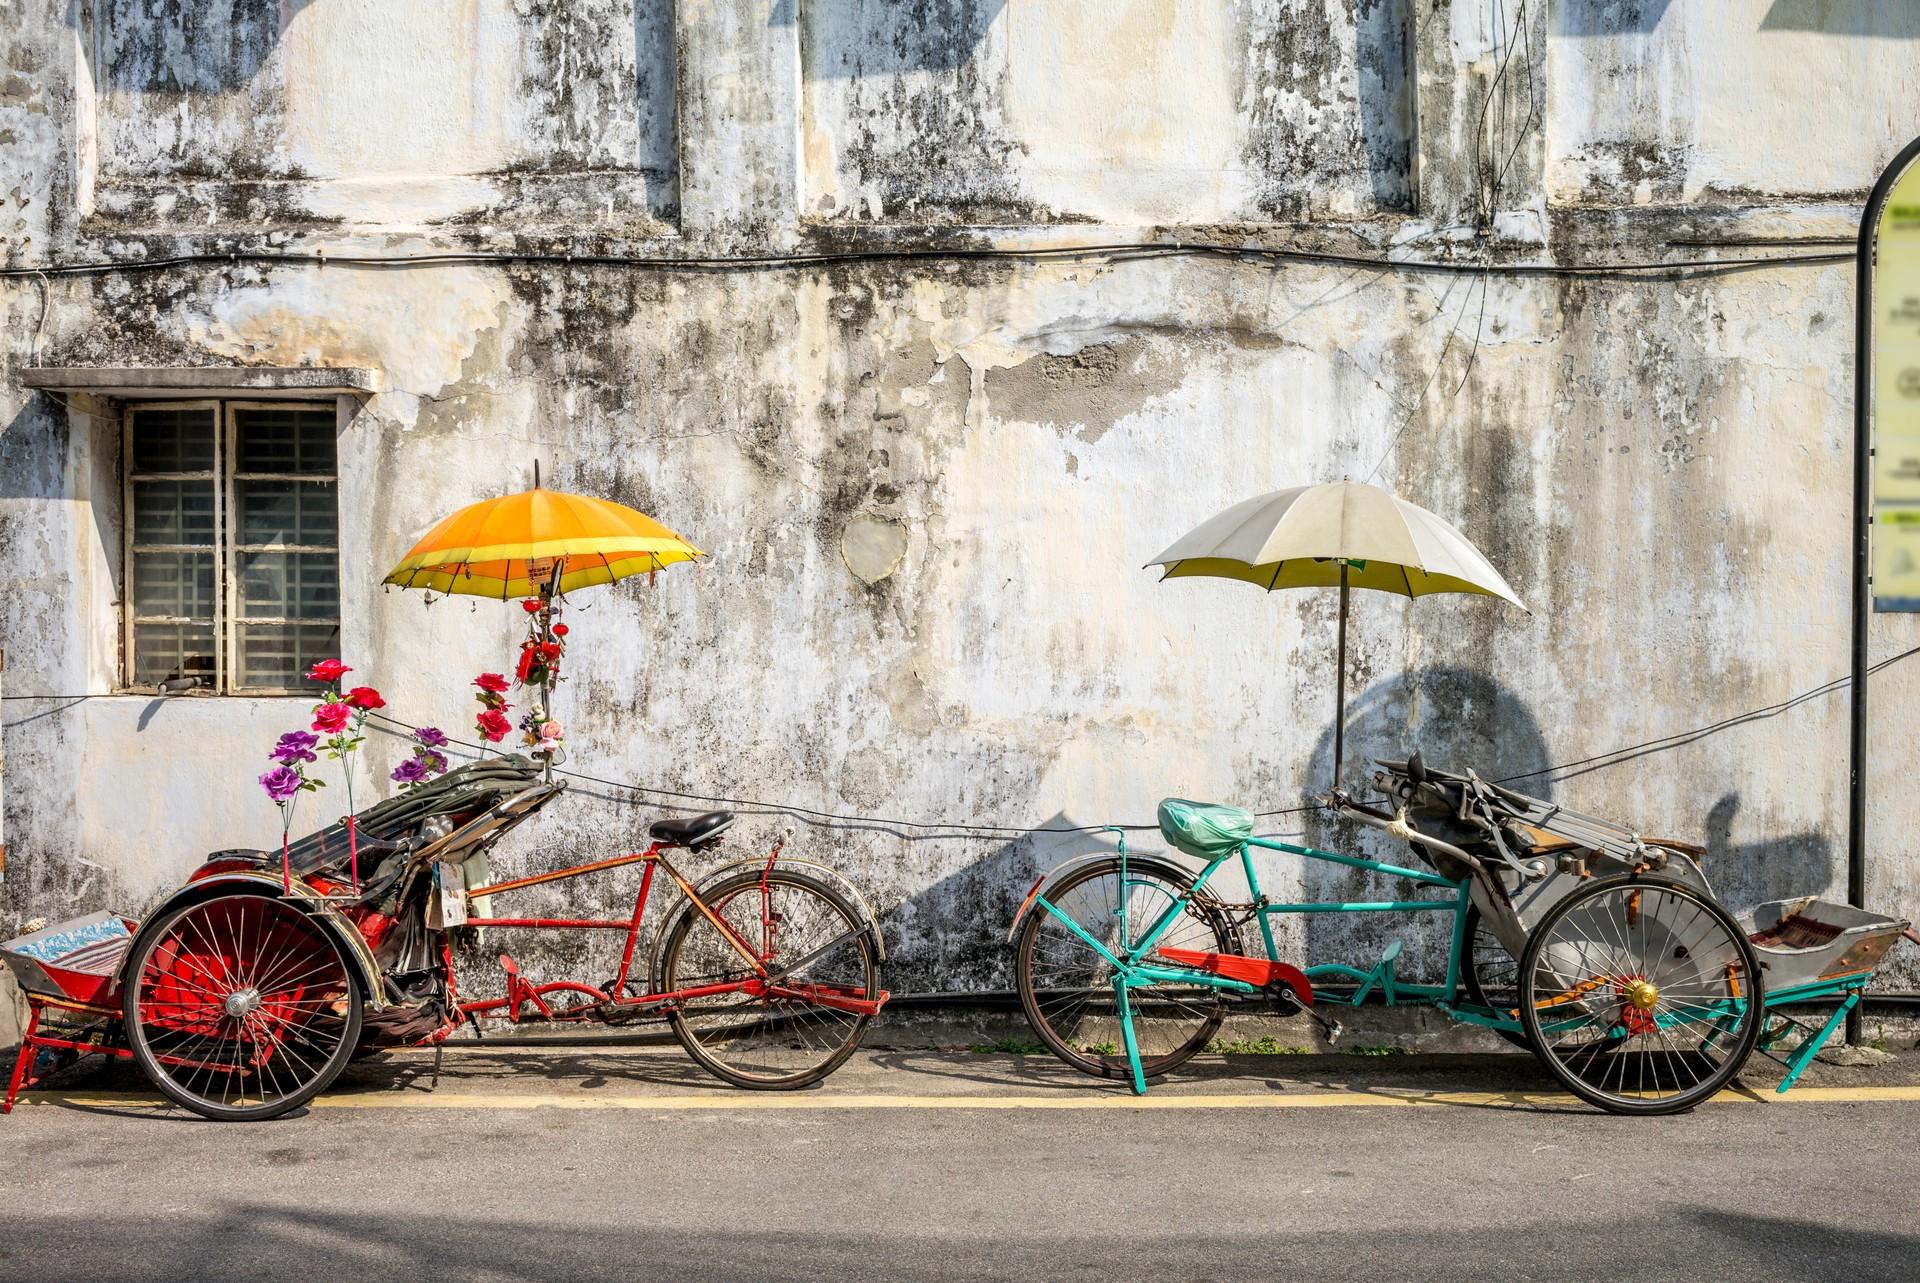 Trishaw cabs in Penang